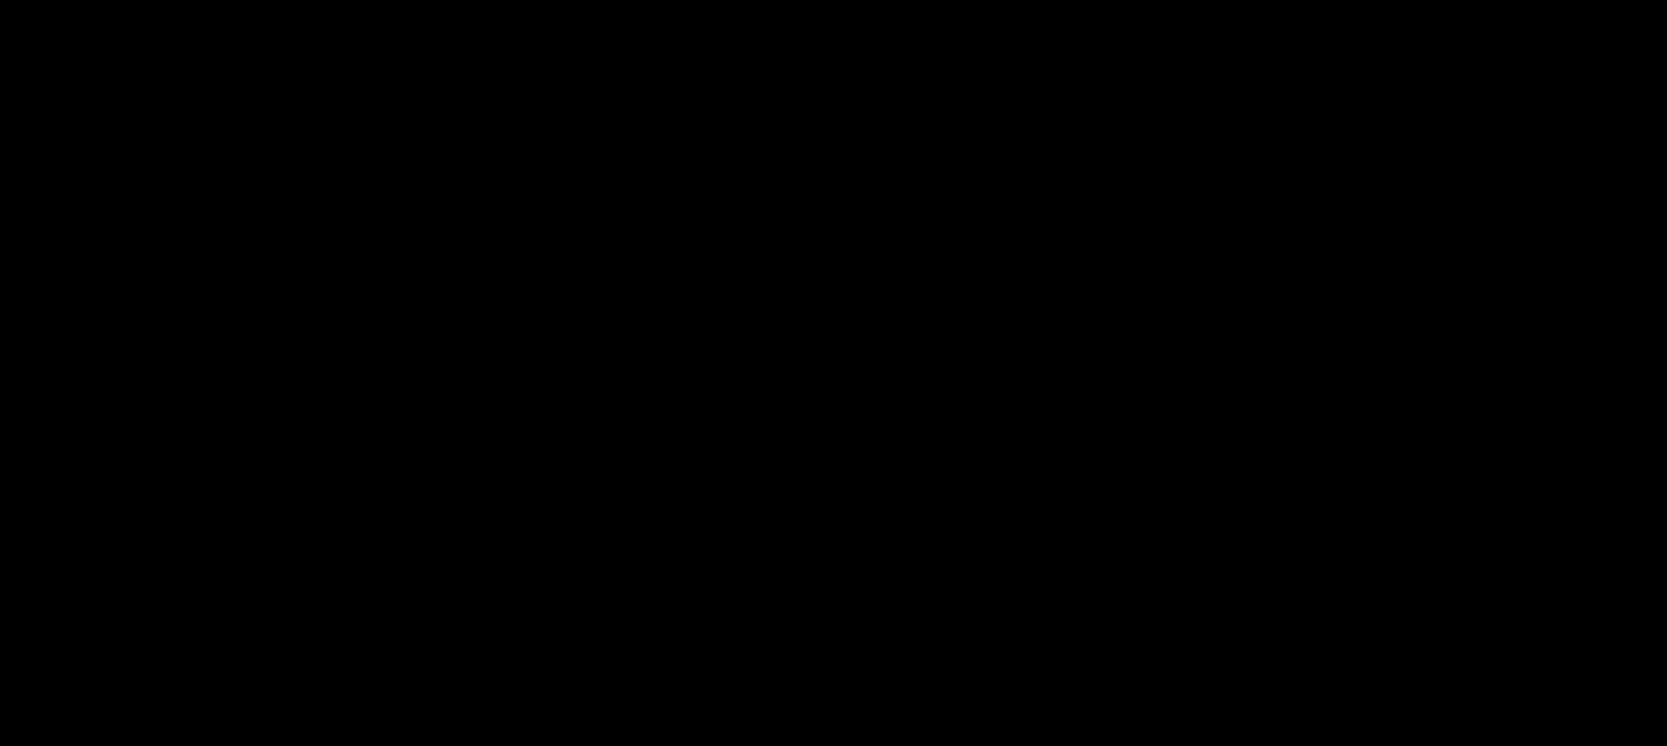 A 1 1 TheBoxCryoSmall-01